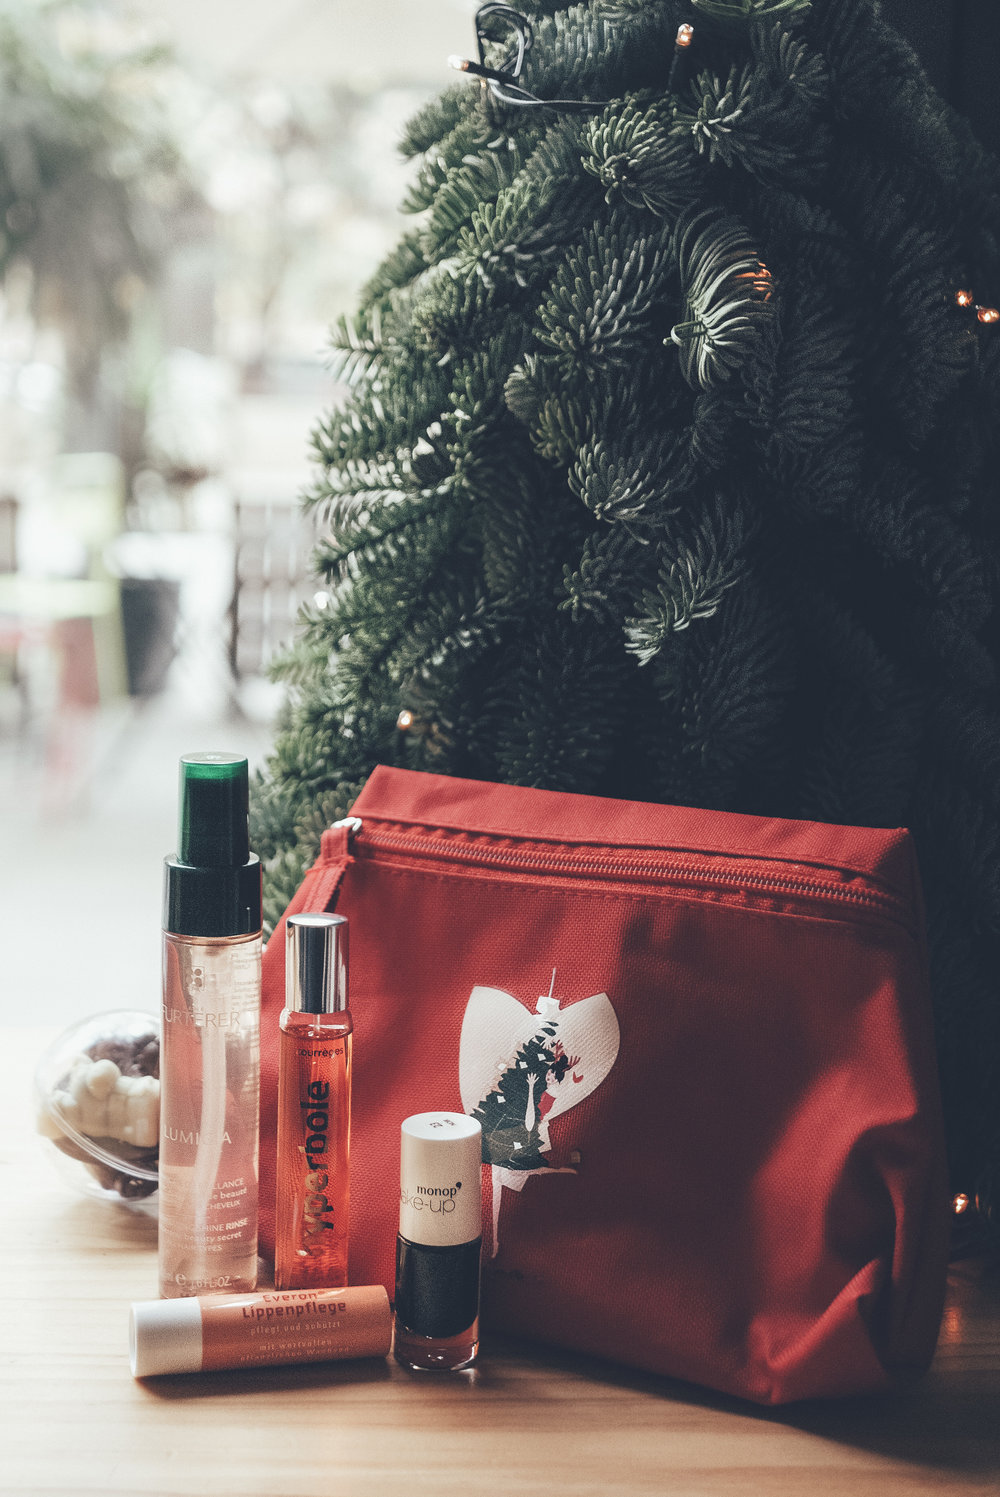 Pochette de Janette NOËL 2016 Christmas Luxembourg